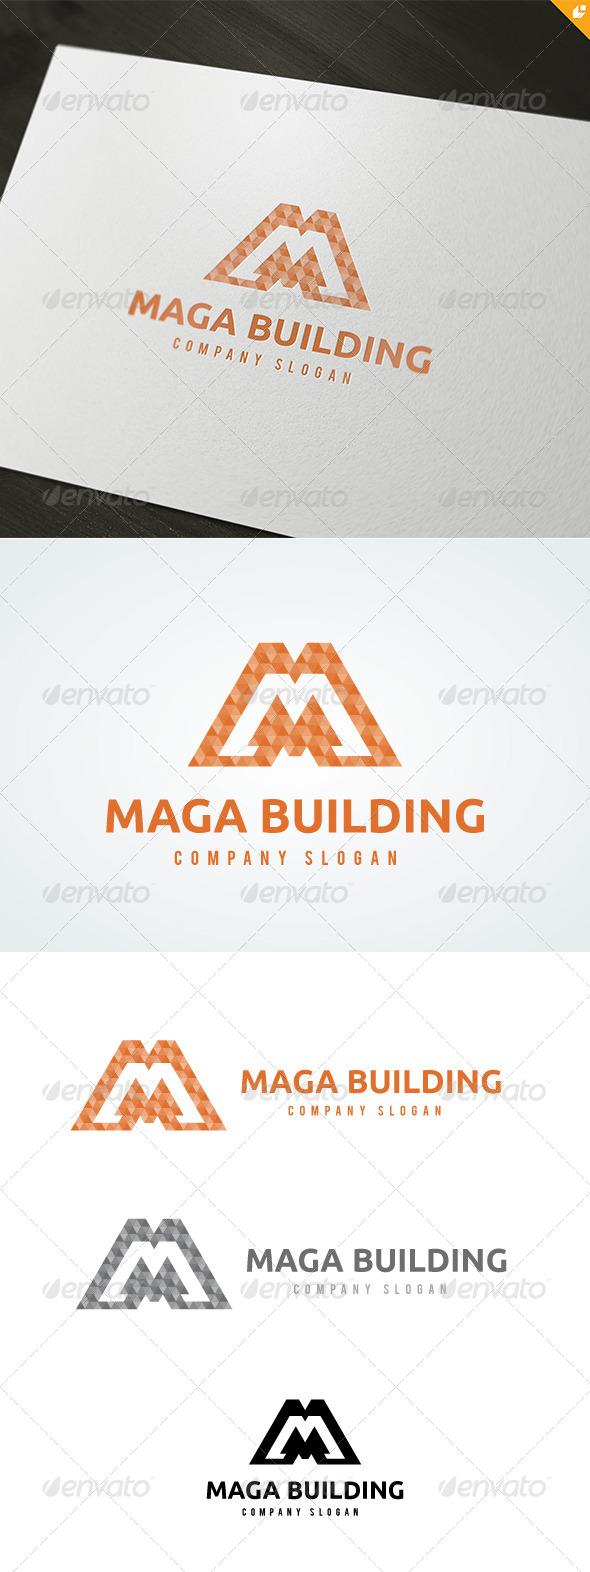 Maga Building Logo - 3d Abstract